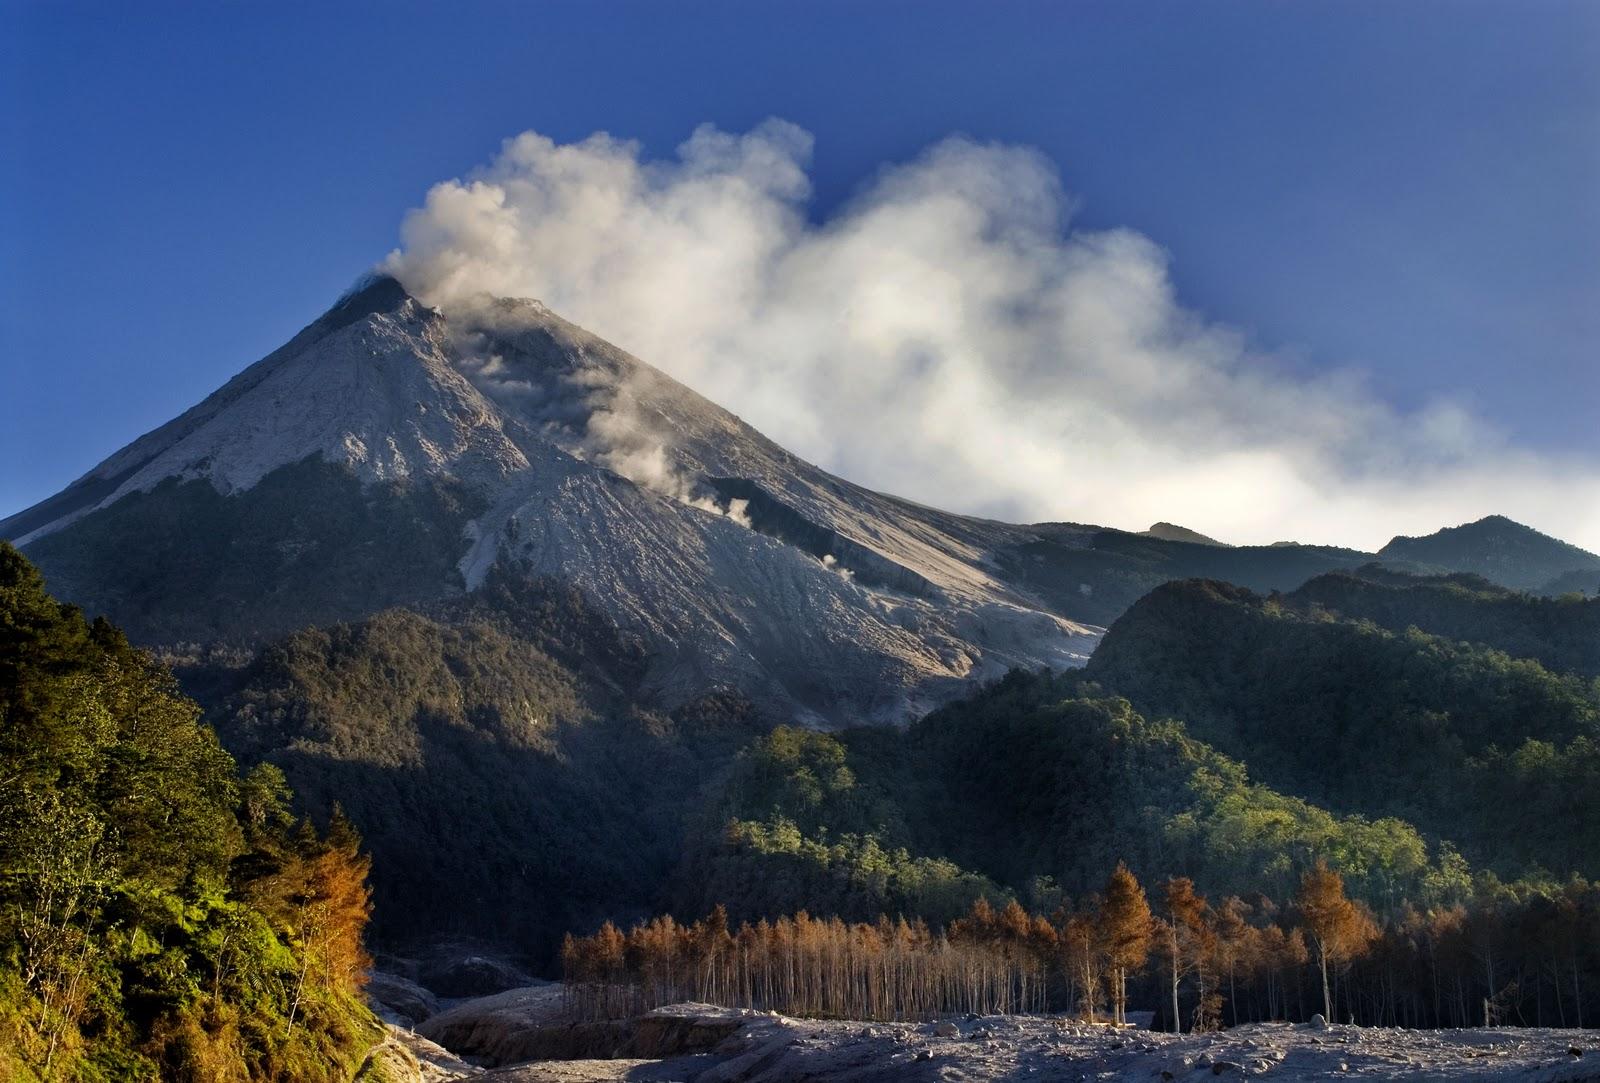 Mengenal Gunung Merapi ~ Background